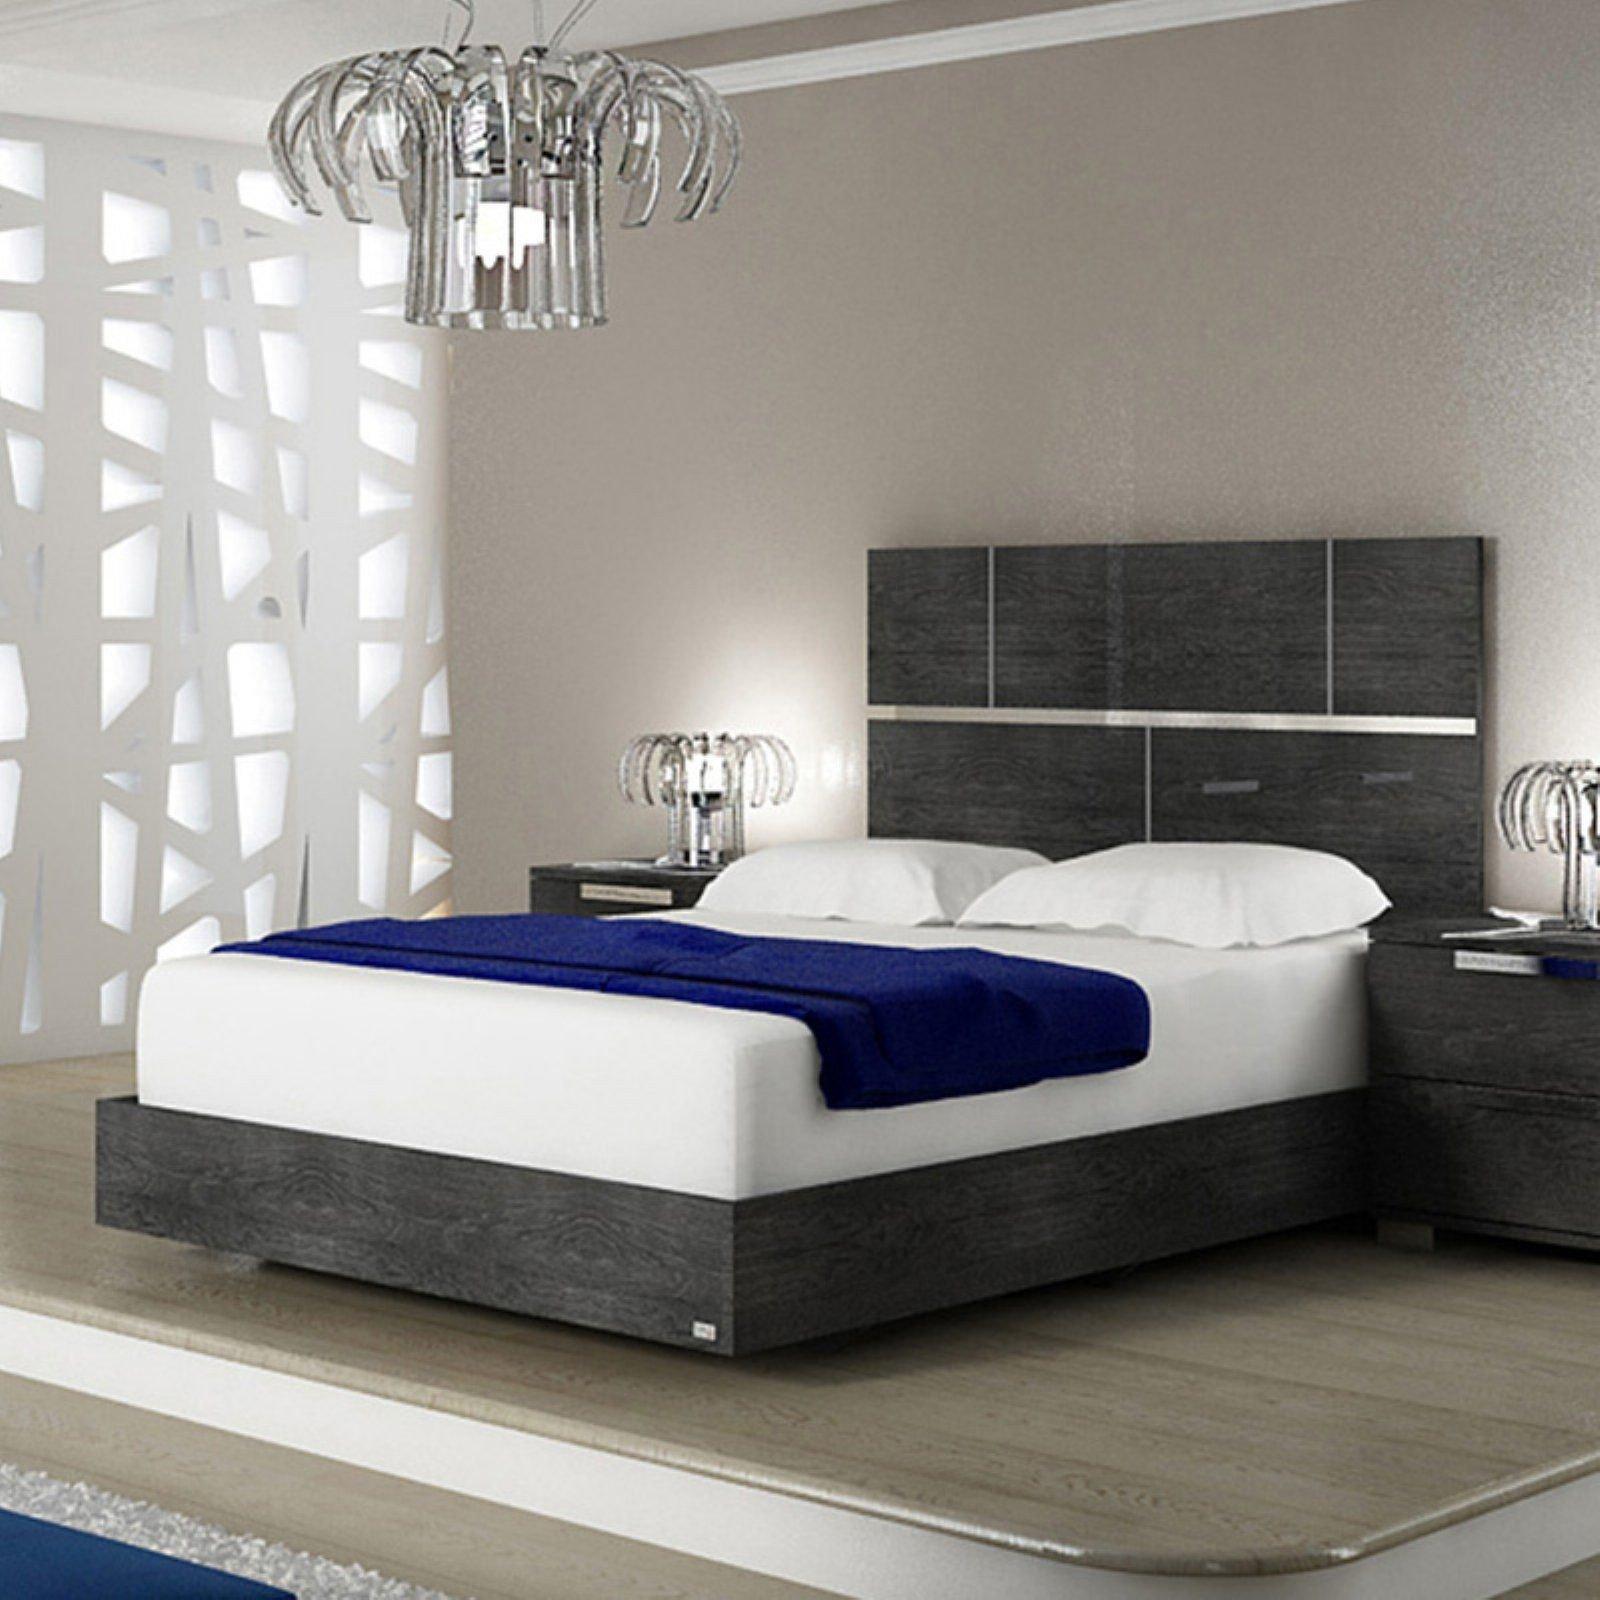 Low Profile Bedroom Set Best Of Casabianca Milo Low Profile Lacquer Bed Size King